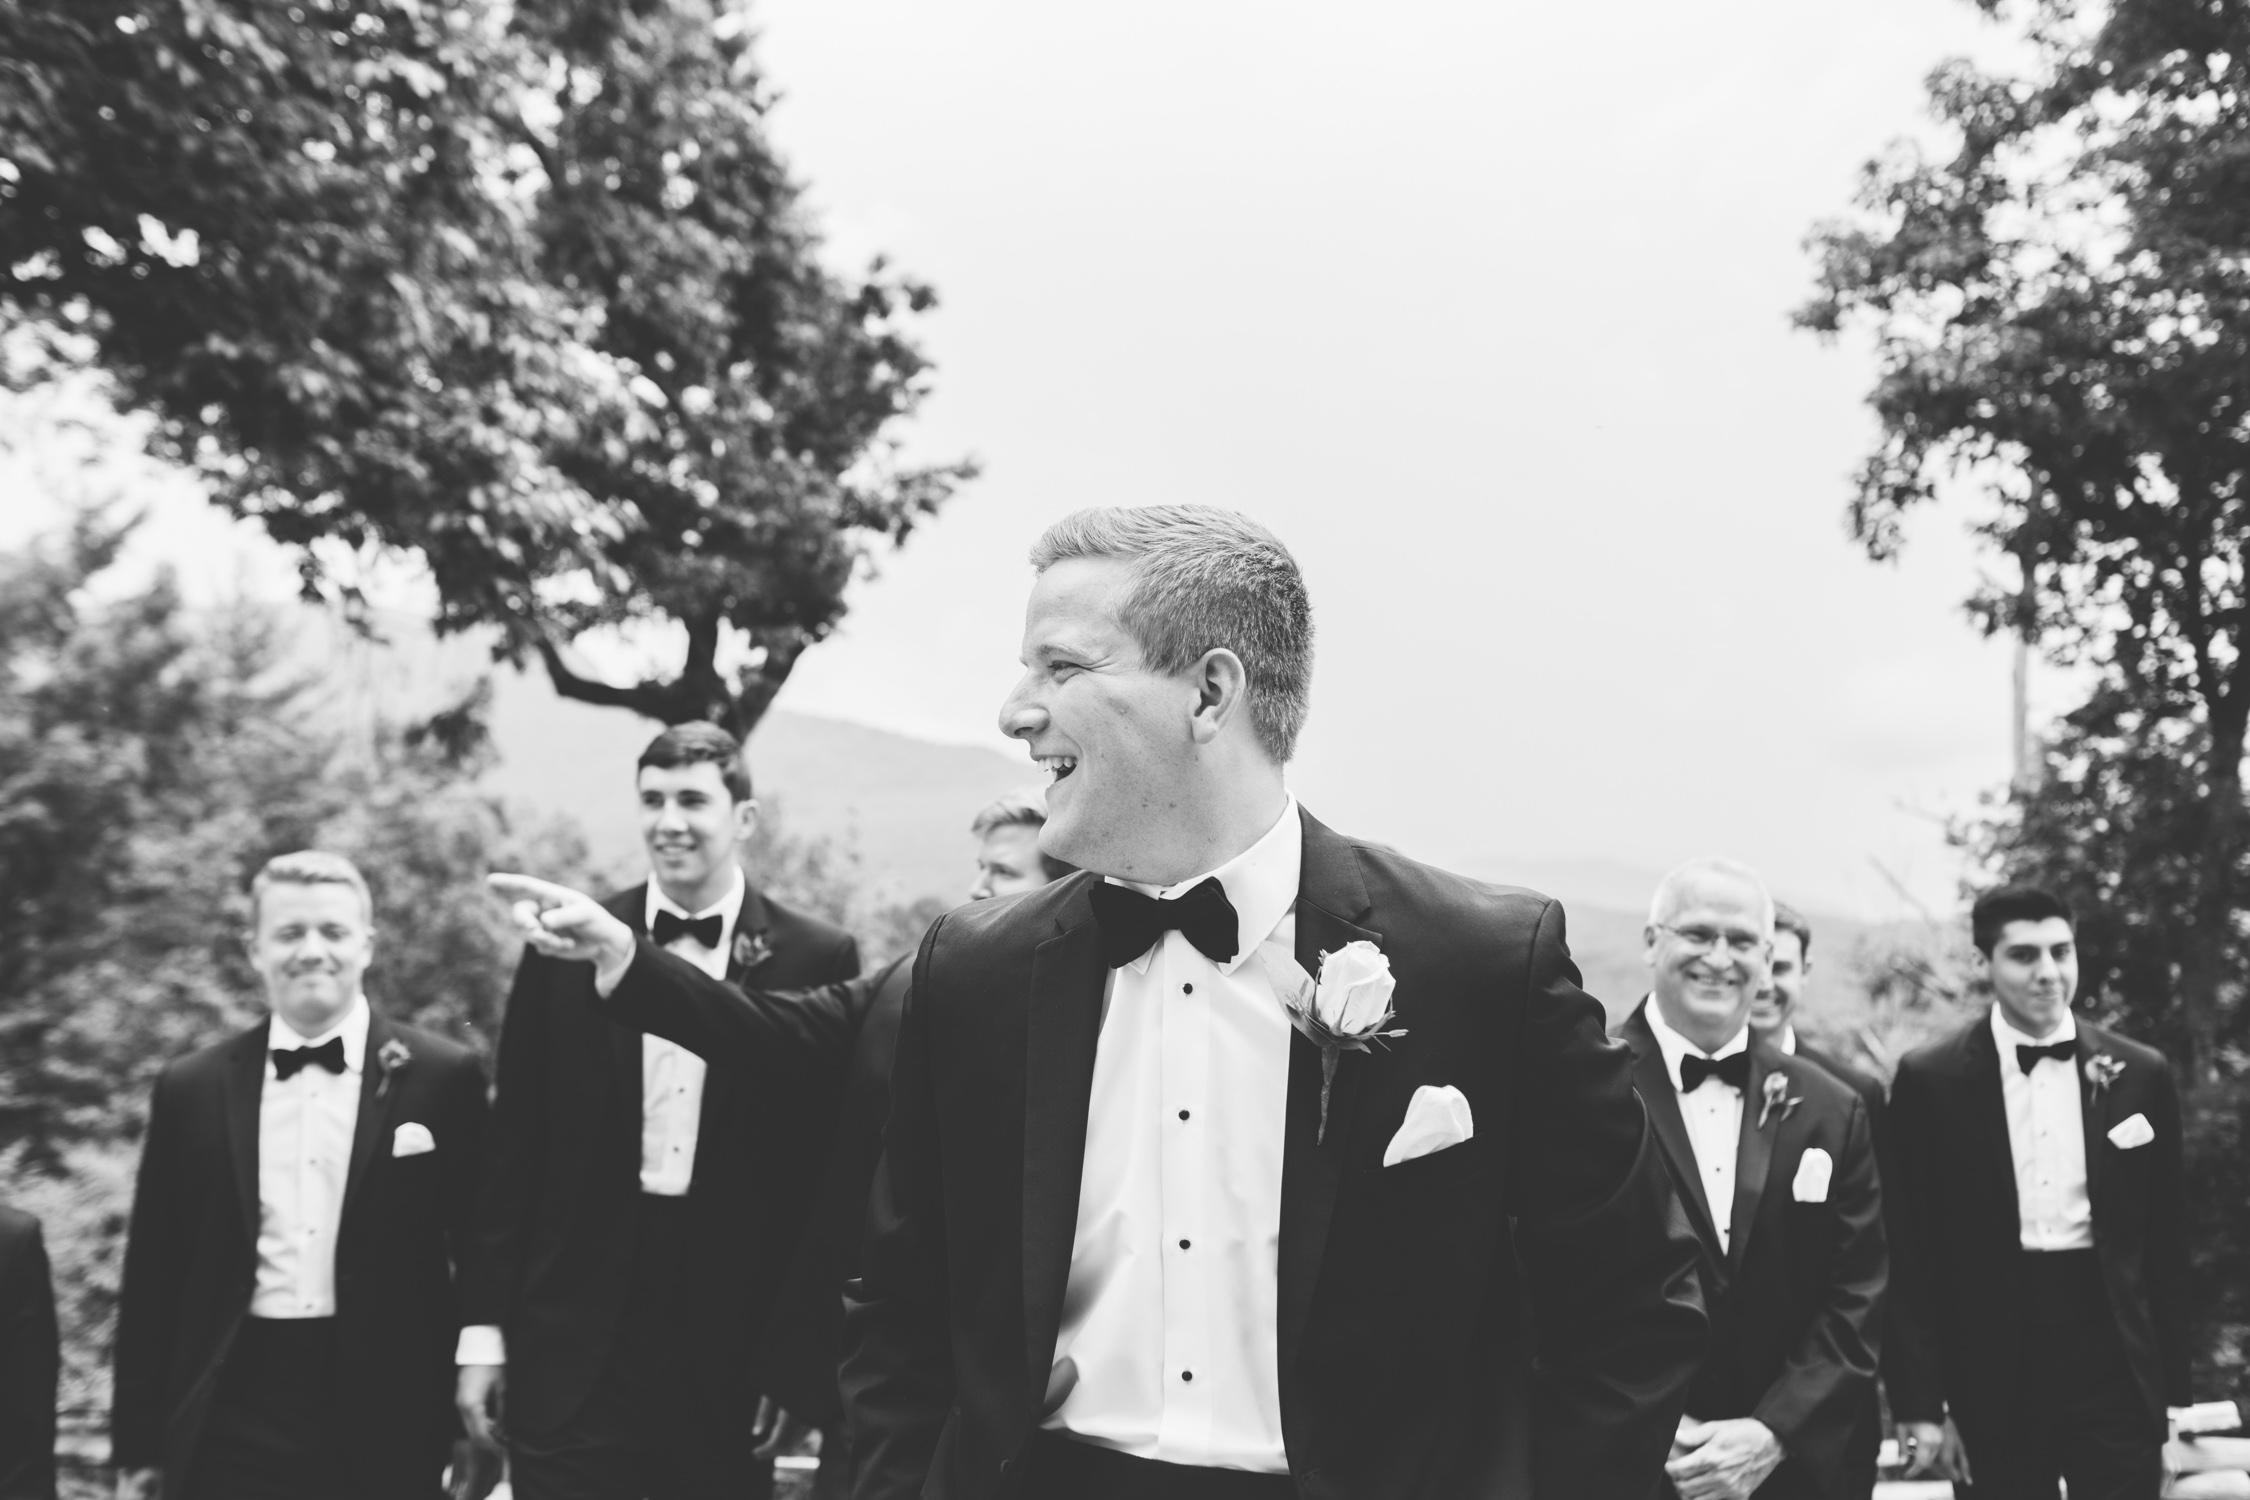 Knoxville Photographer Classic Outdoor Wedding Groomsmen Black & White